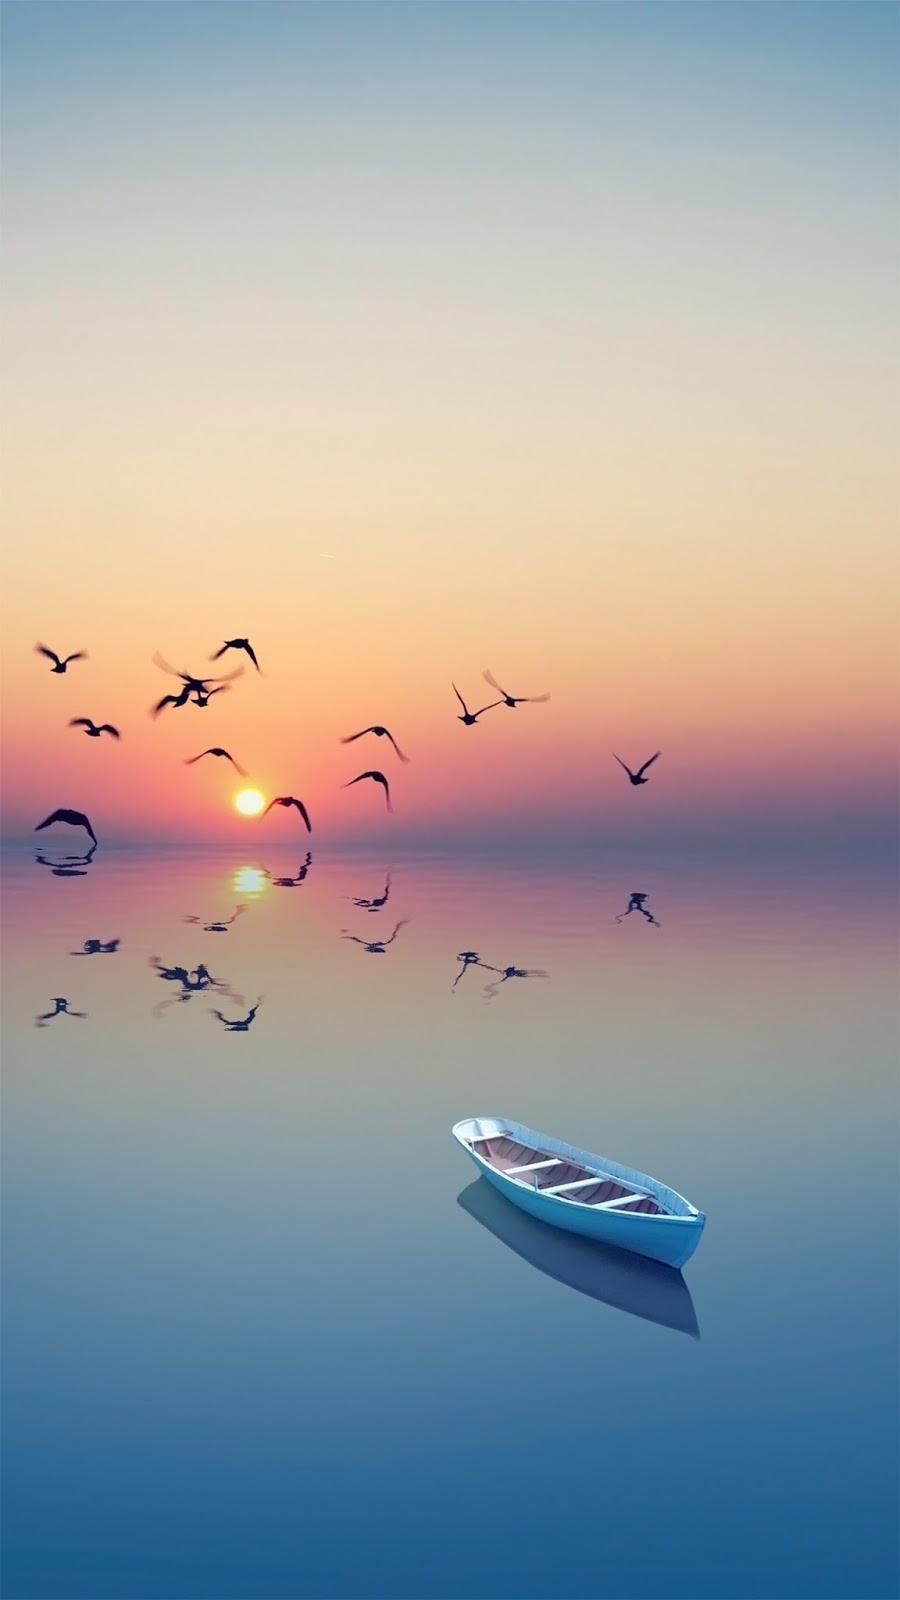 Free Wallpaper Phone: Boat Sunset Wallpaper LG G5